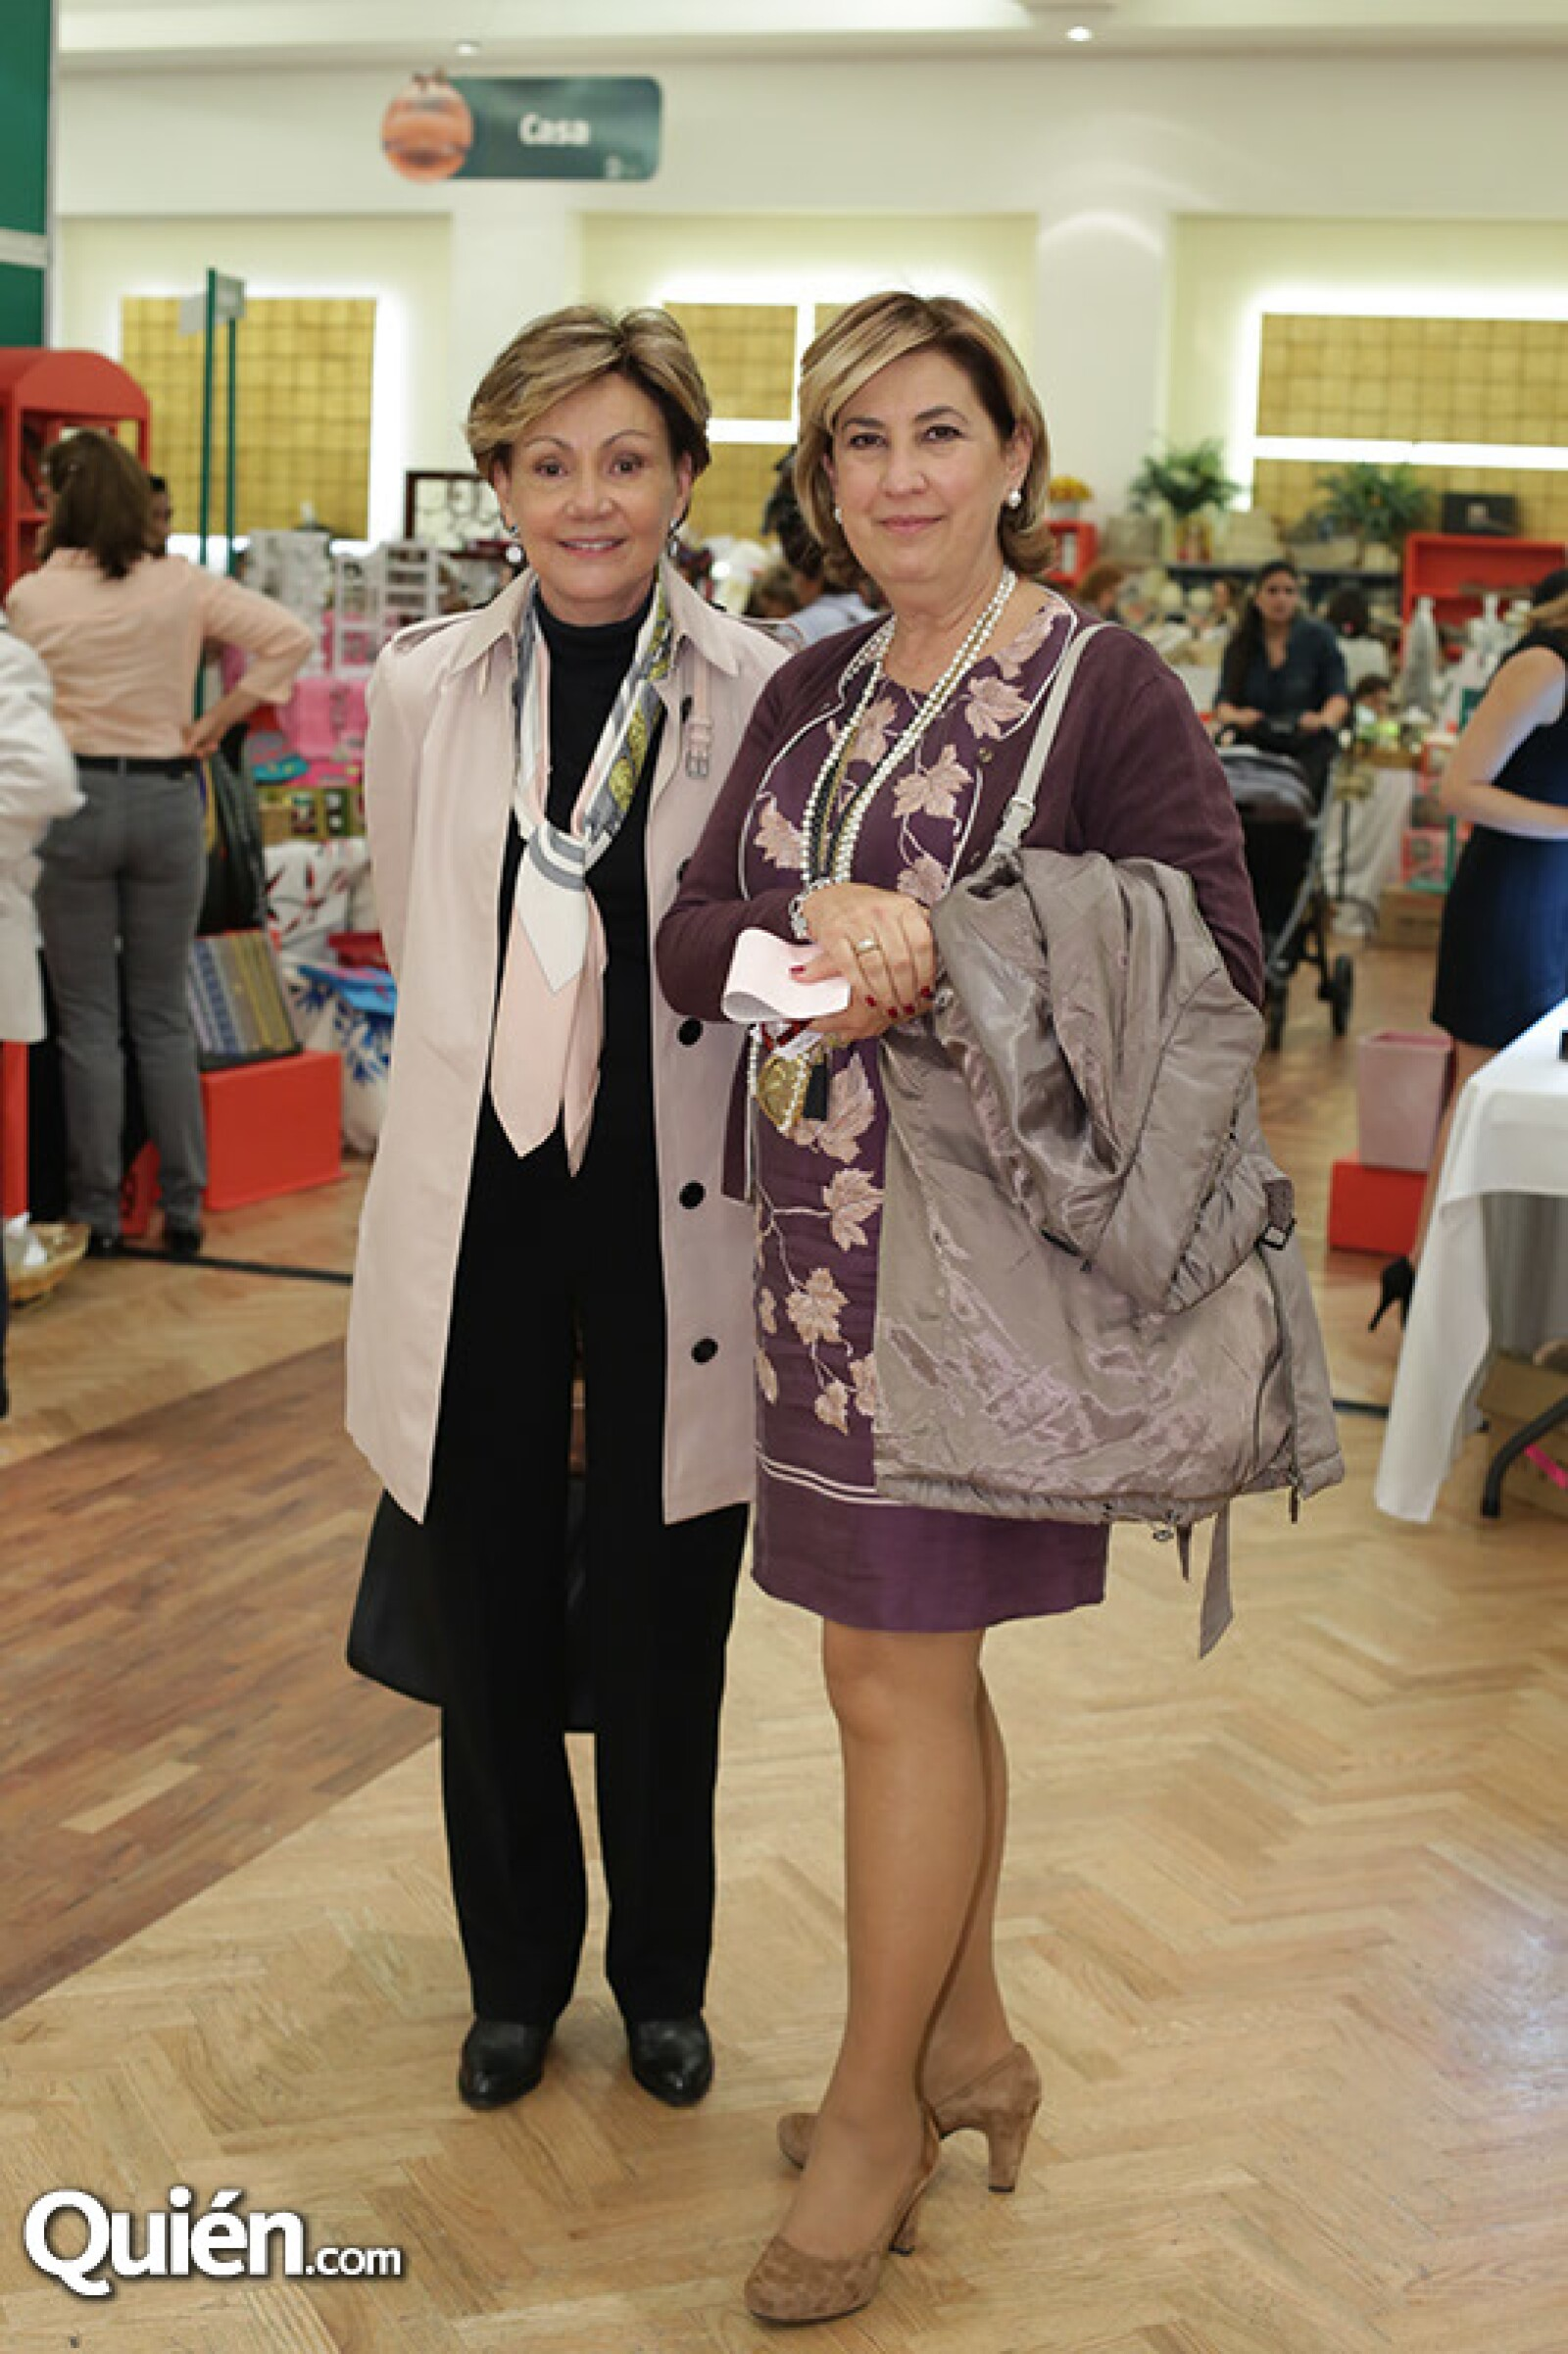 Frida Balmori y María Fernanda Carredano